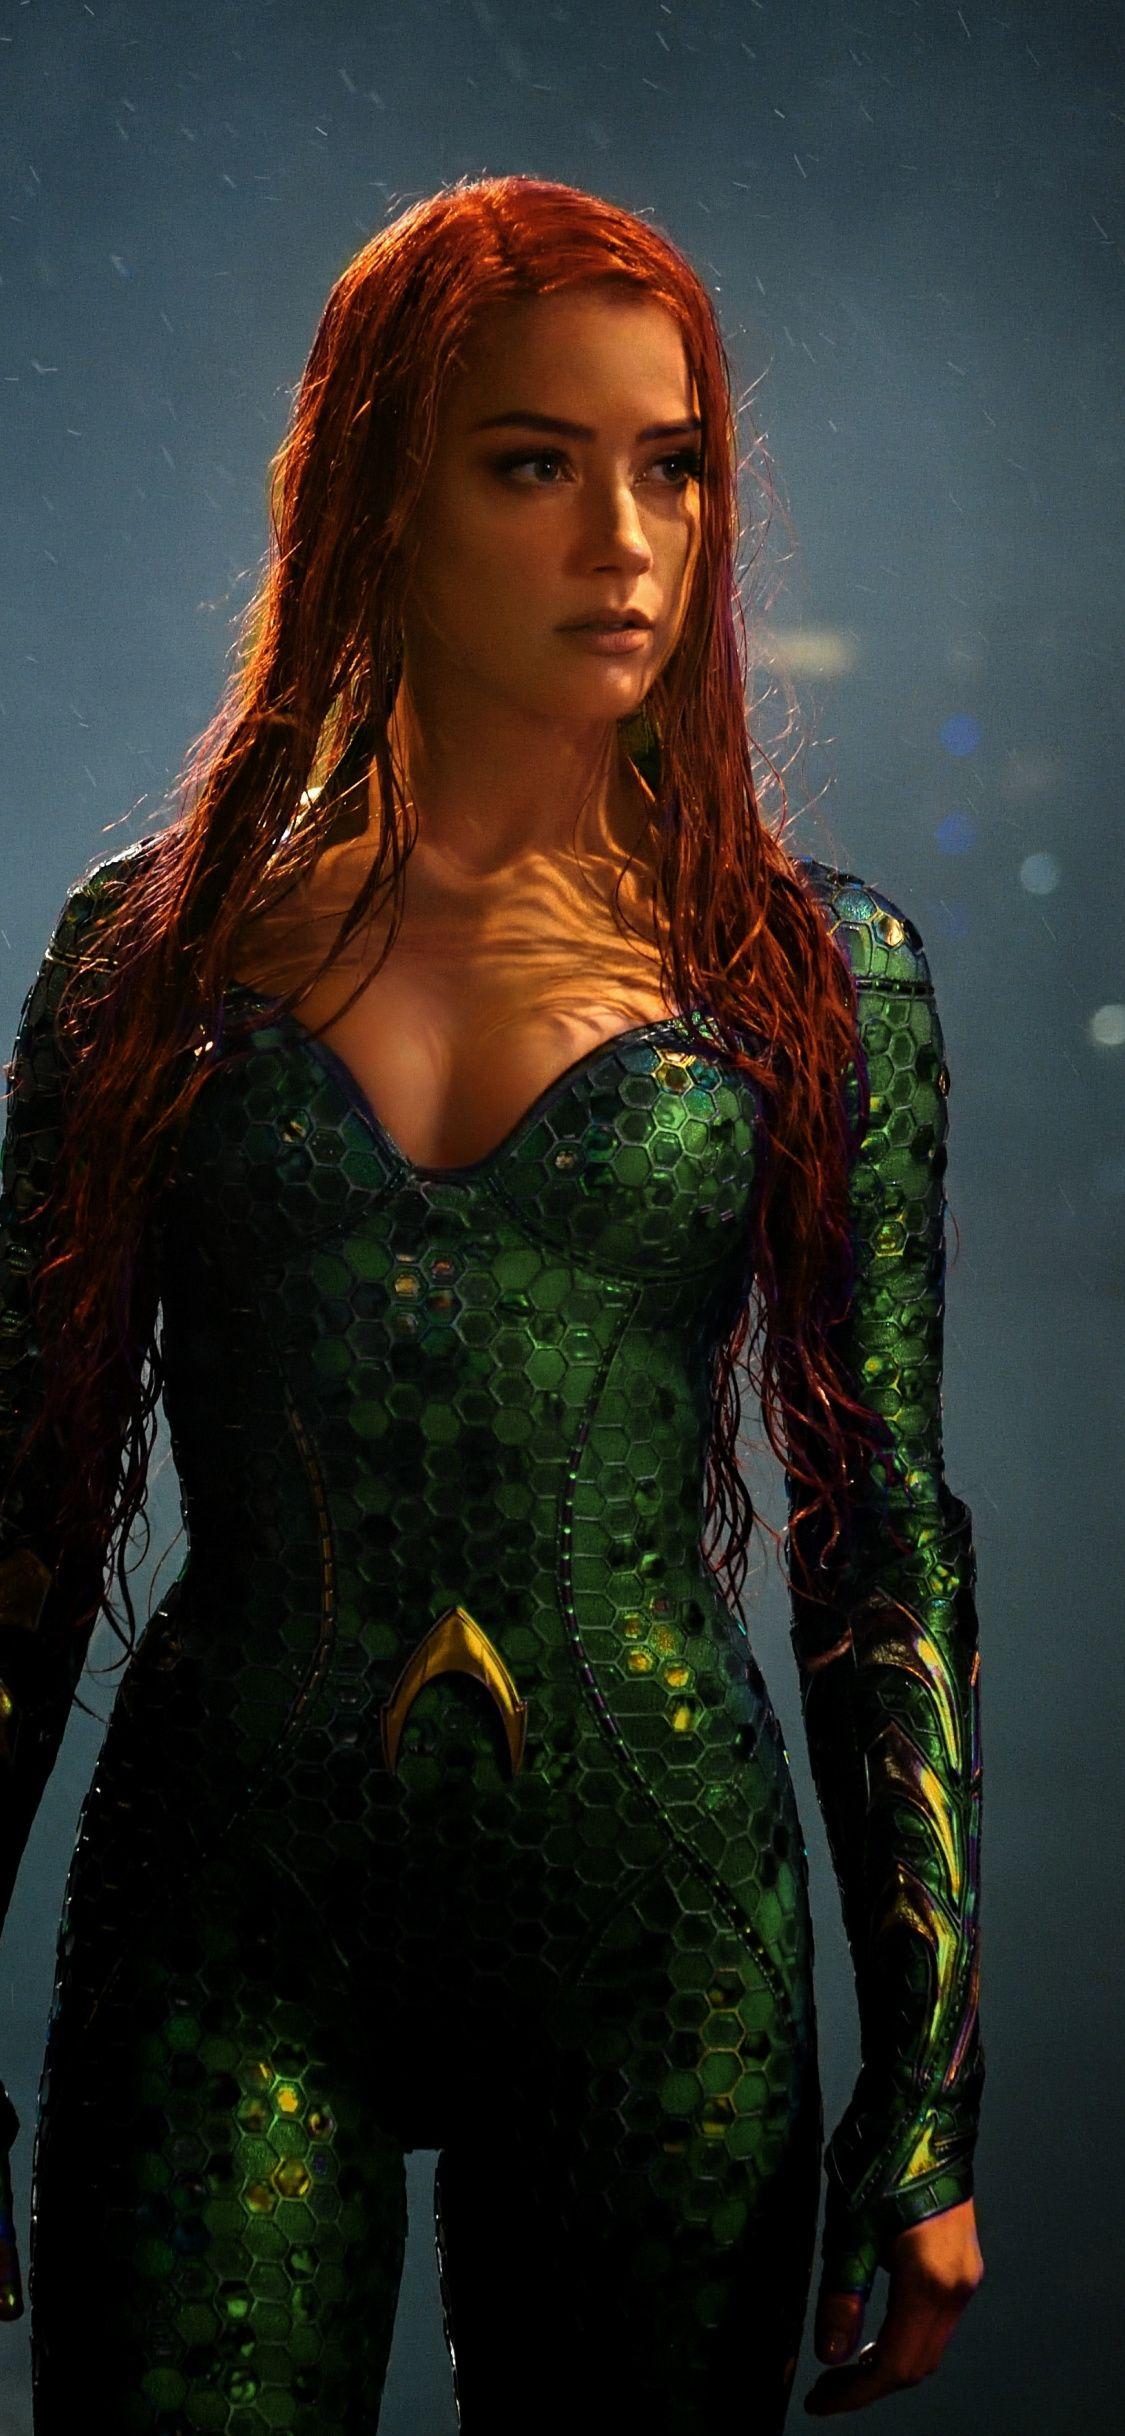 Movie Aquaman Amber Heard Mera 1125x2436 Wallpaper Amber Heard Bikini Amber Heard Amber Heard Hot